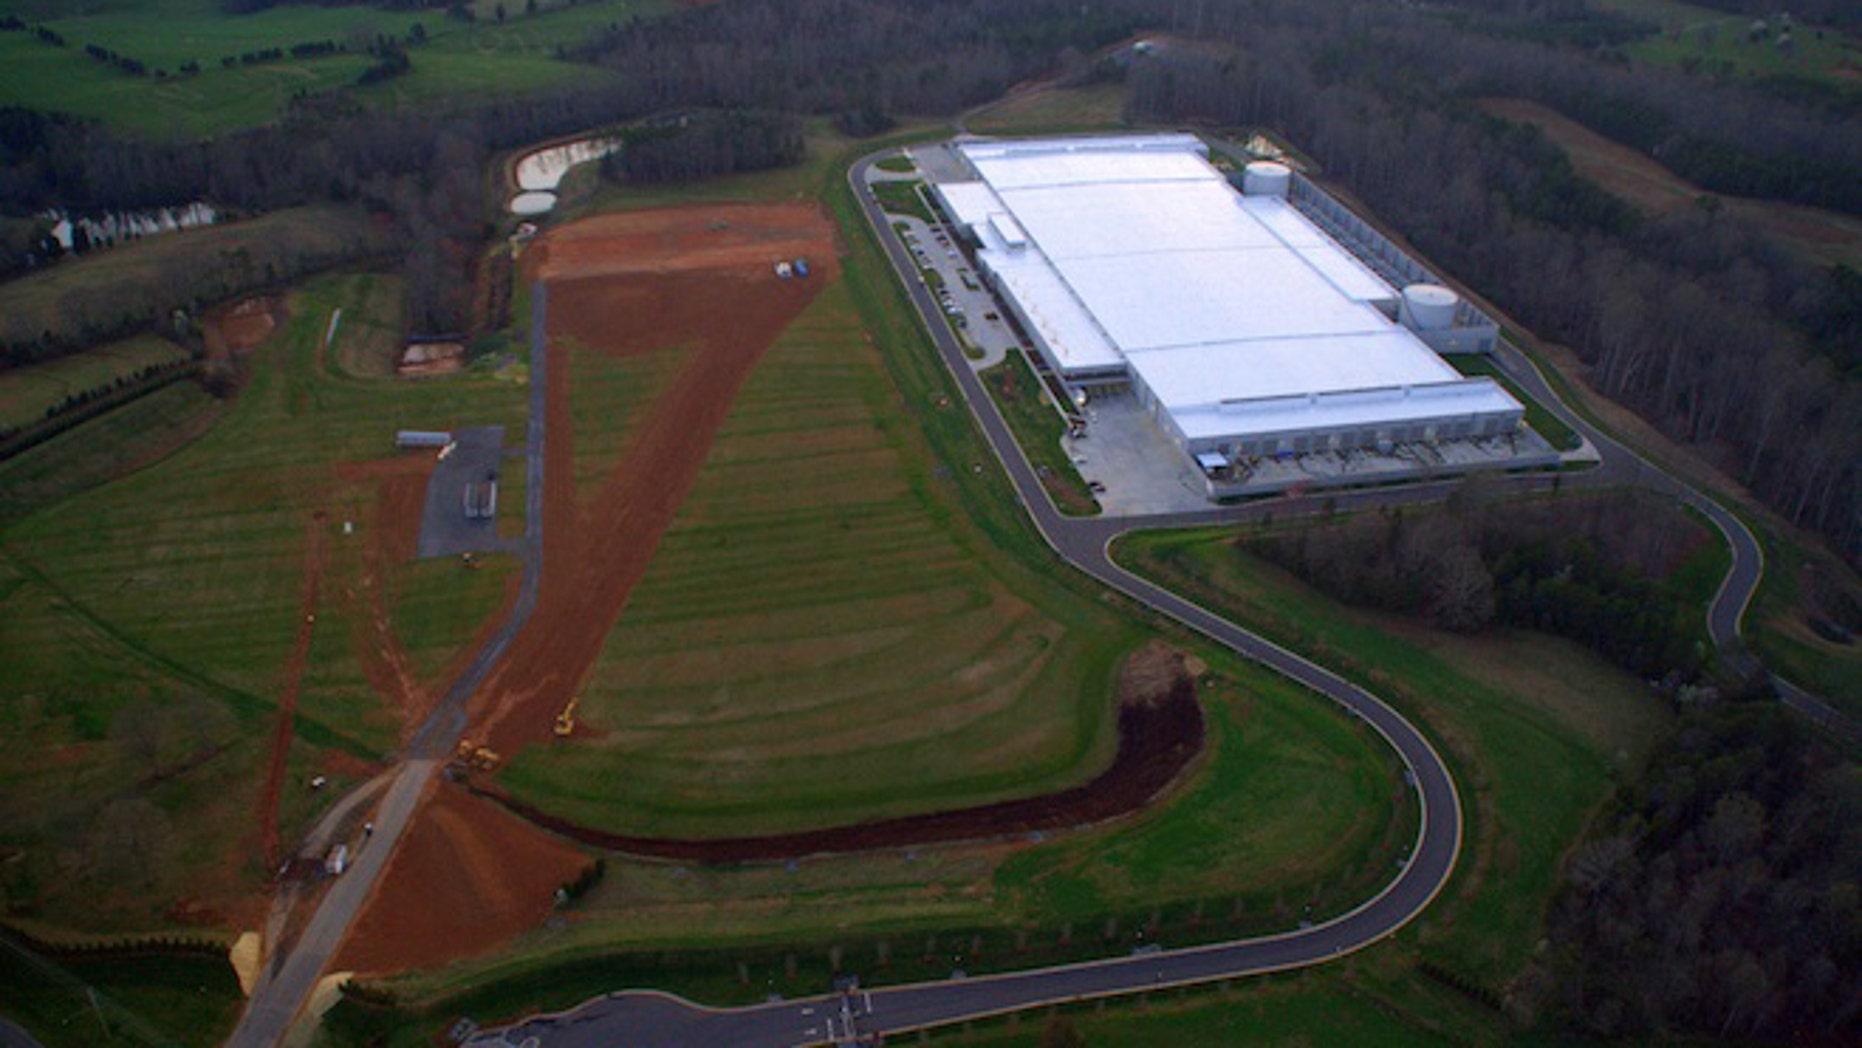 Construction is underway at Apple's Maiden data center in North Carolina.